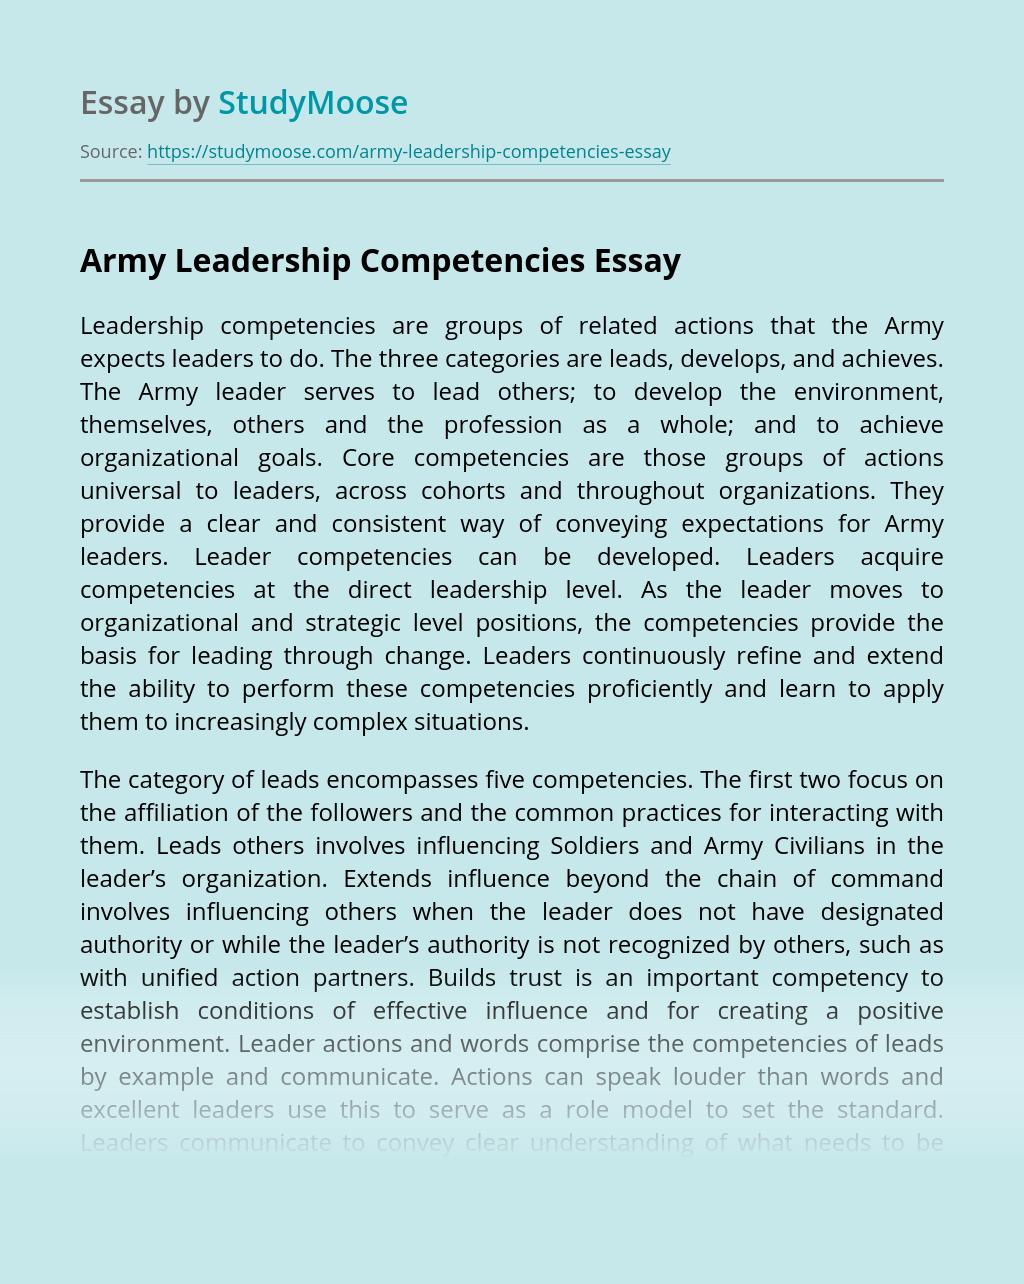 Army Leadership Competencies